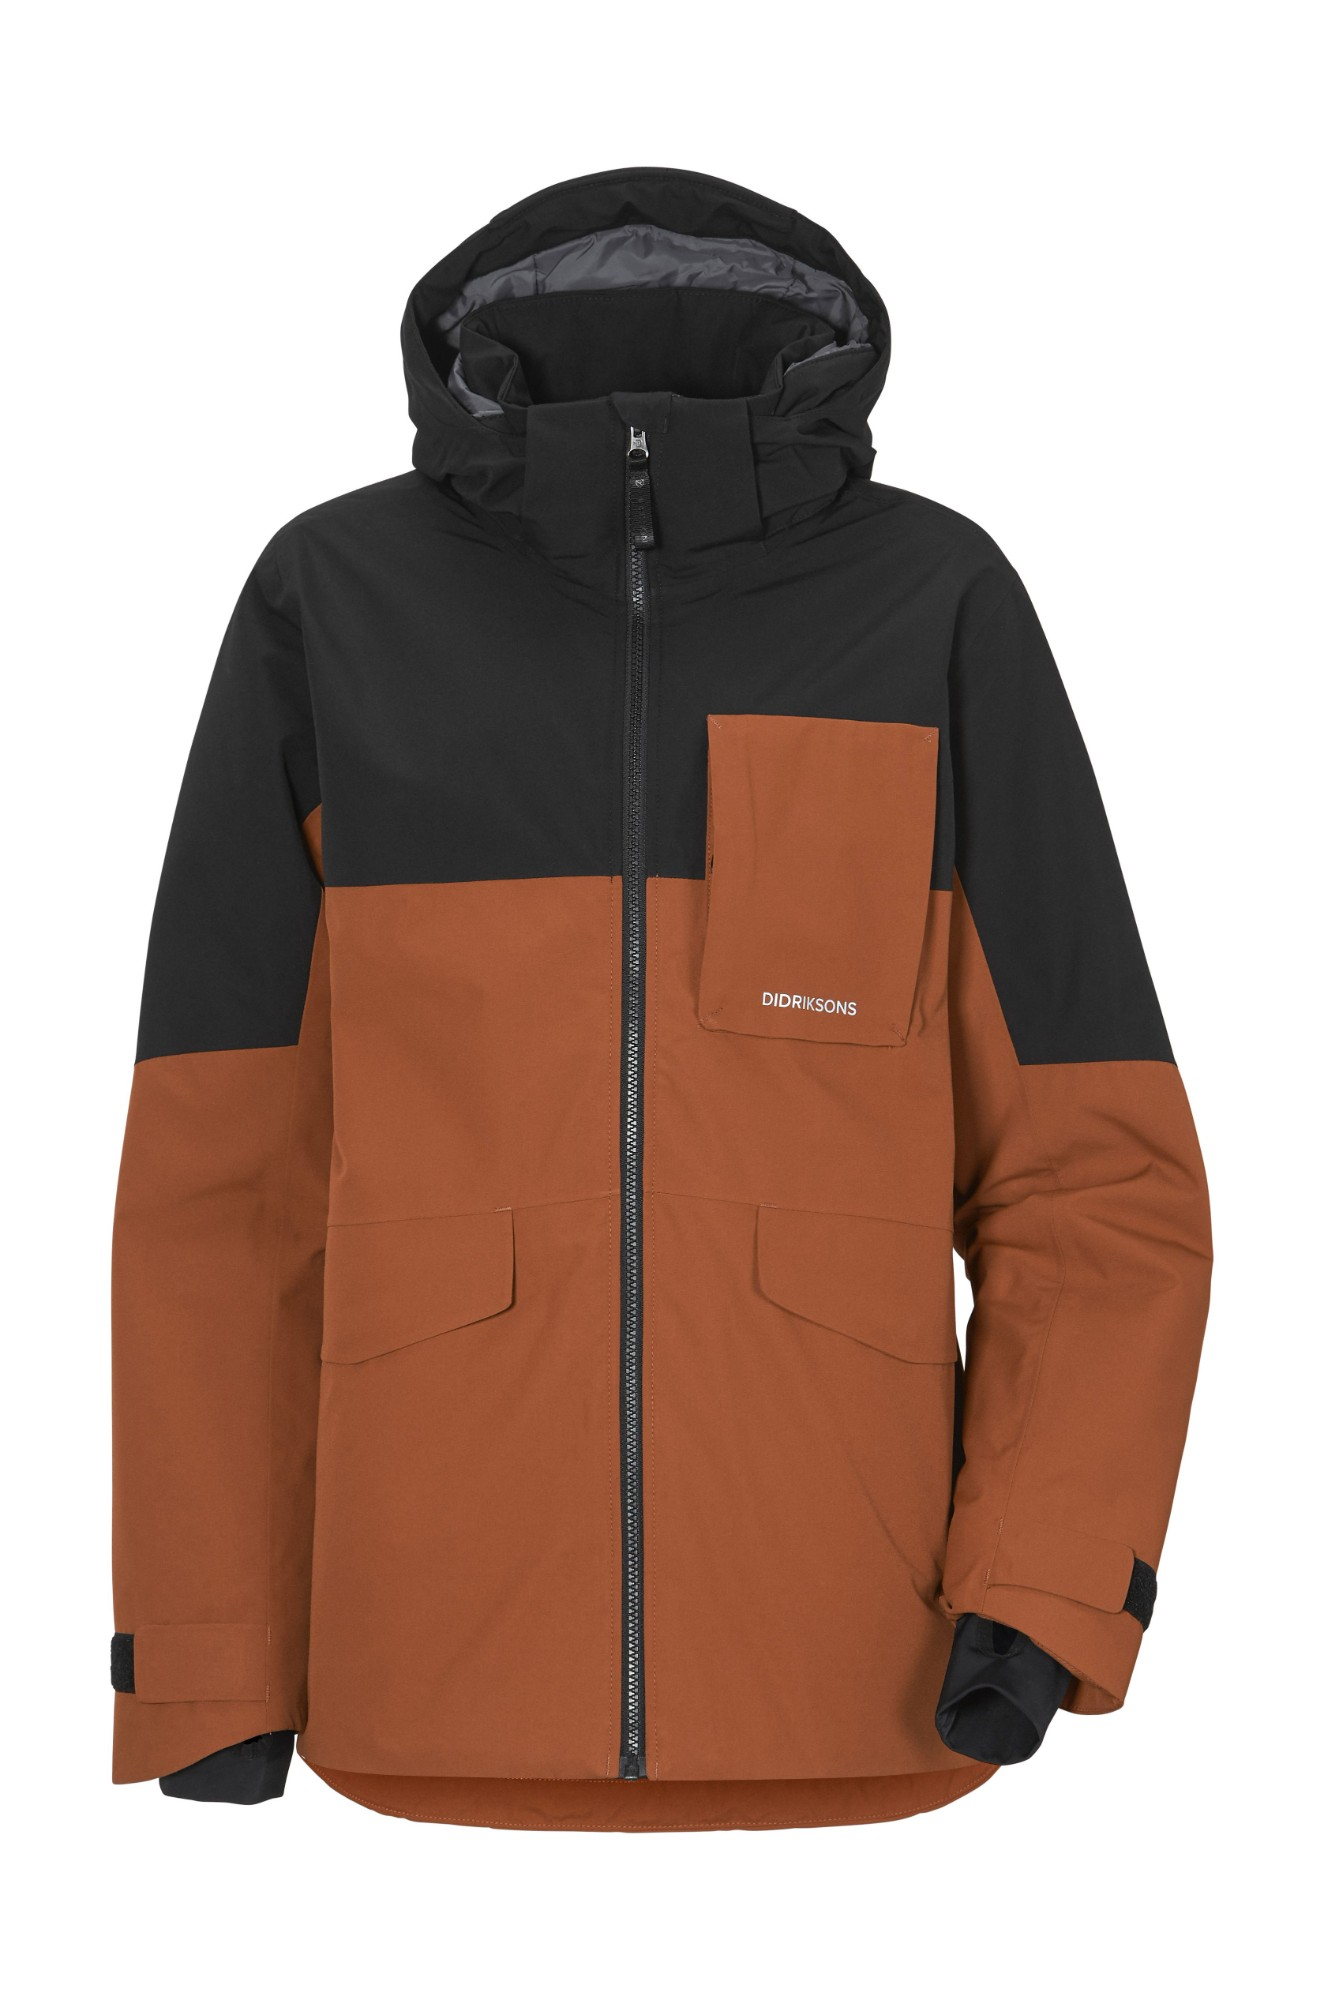 DIDRIKSONS Luke Boy's Jacket 2 Bisquit Brown 140